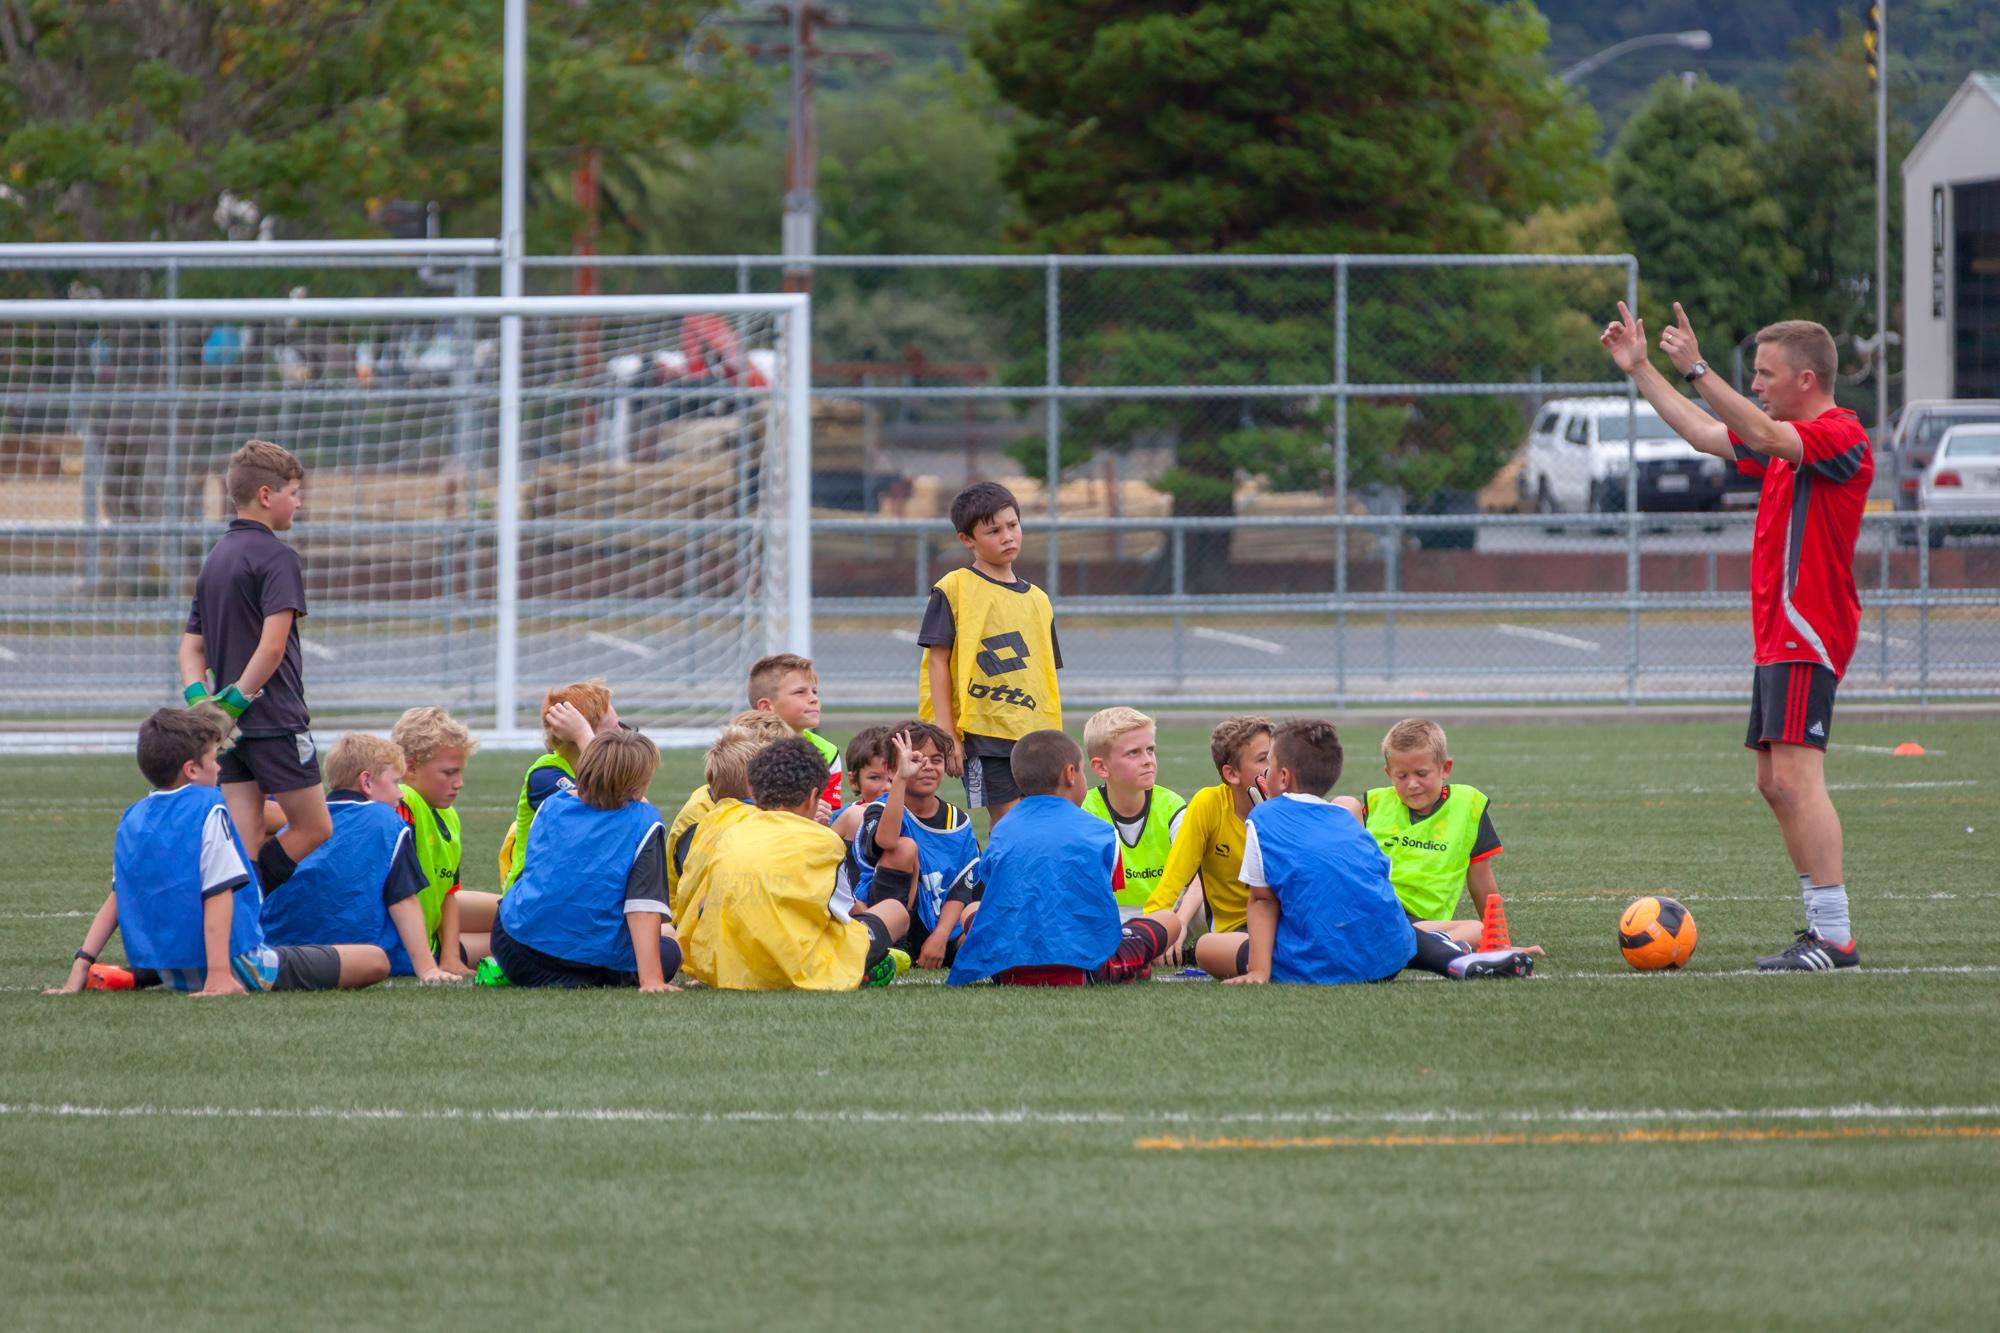 UHCC Soccer Coach 4497